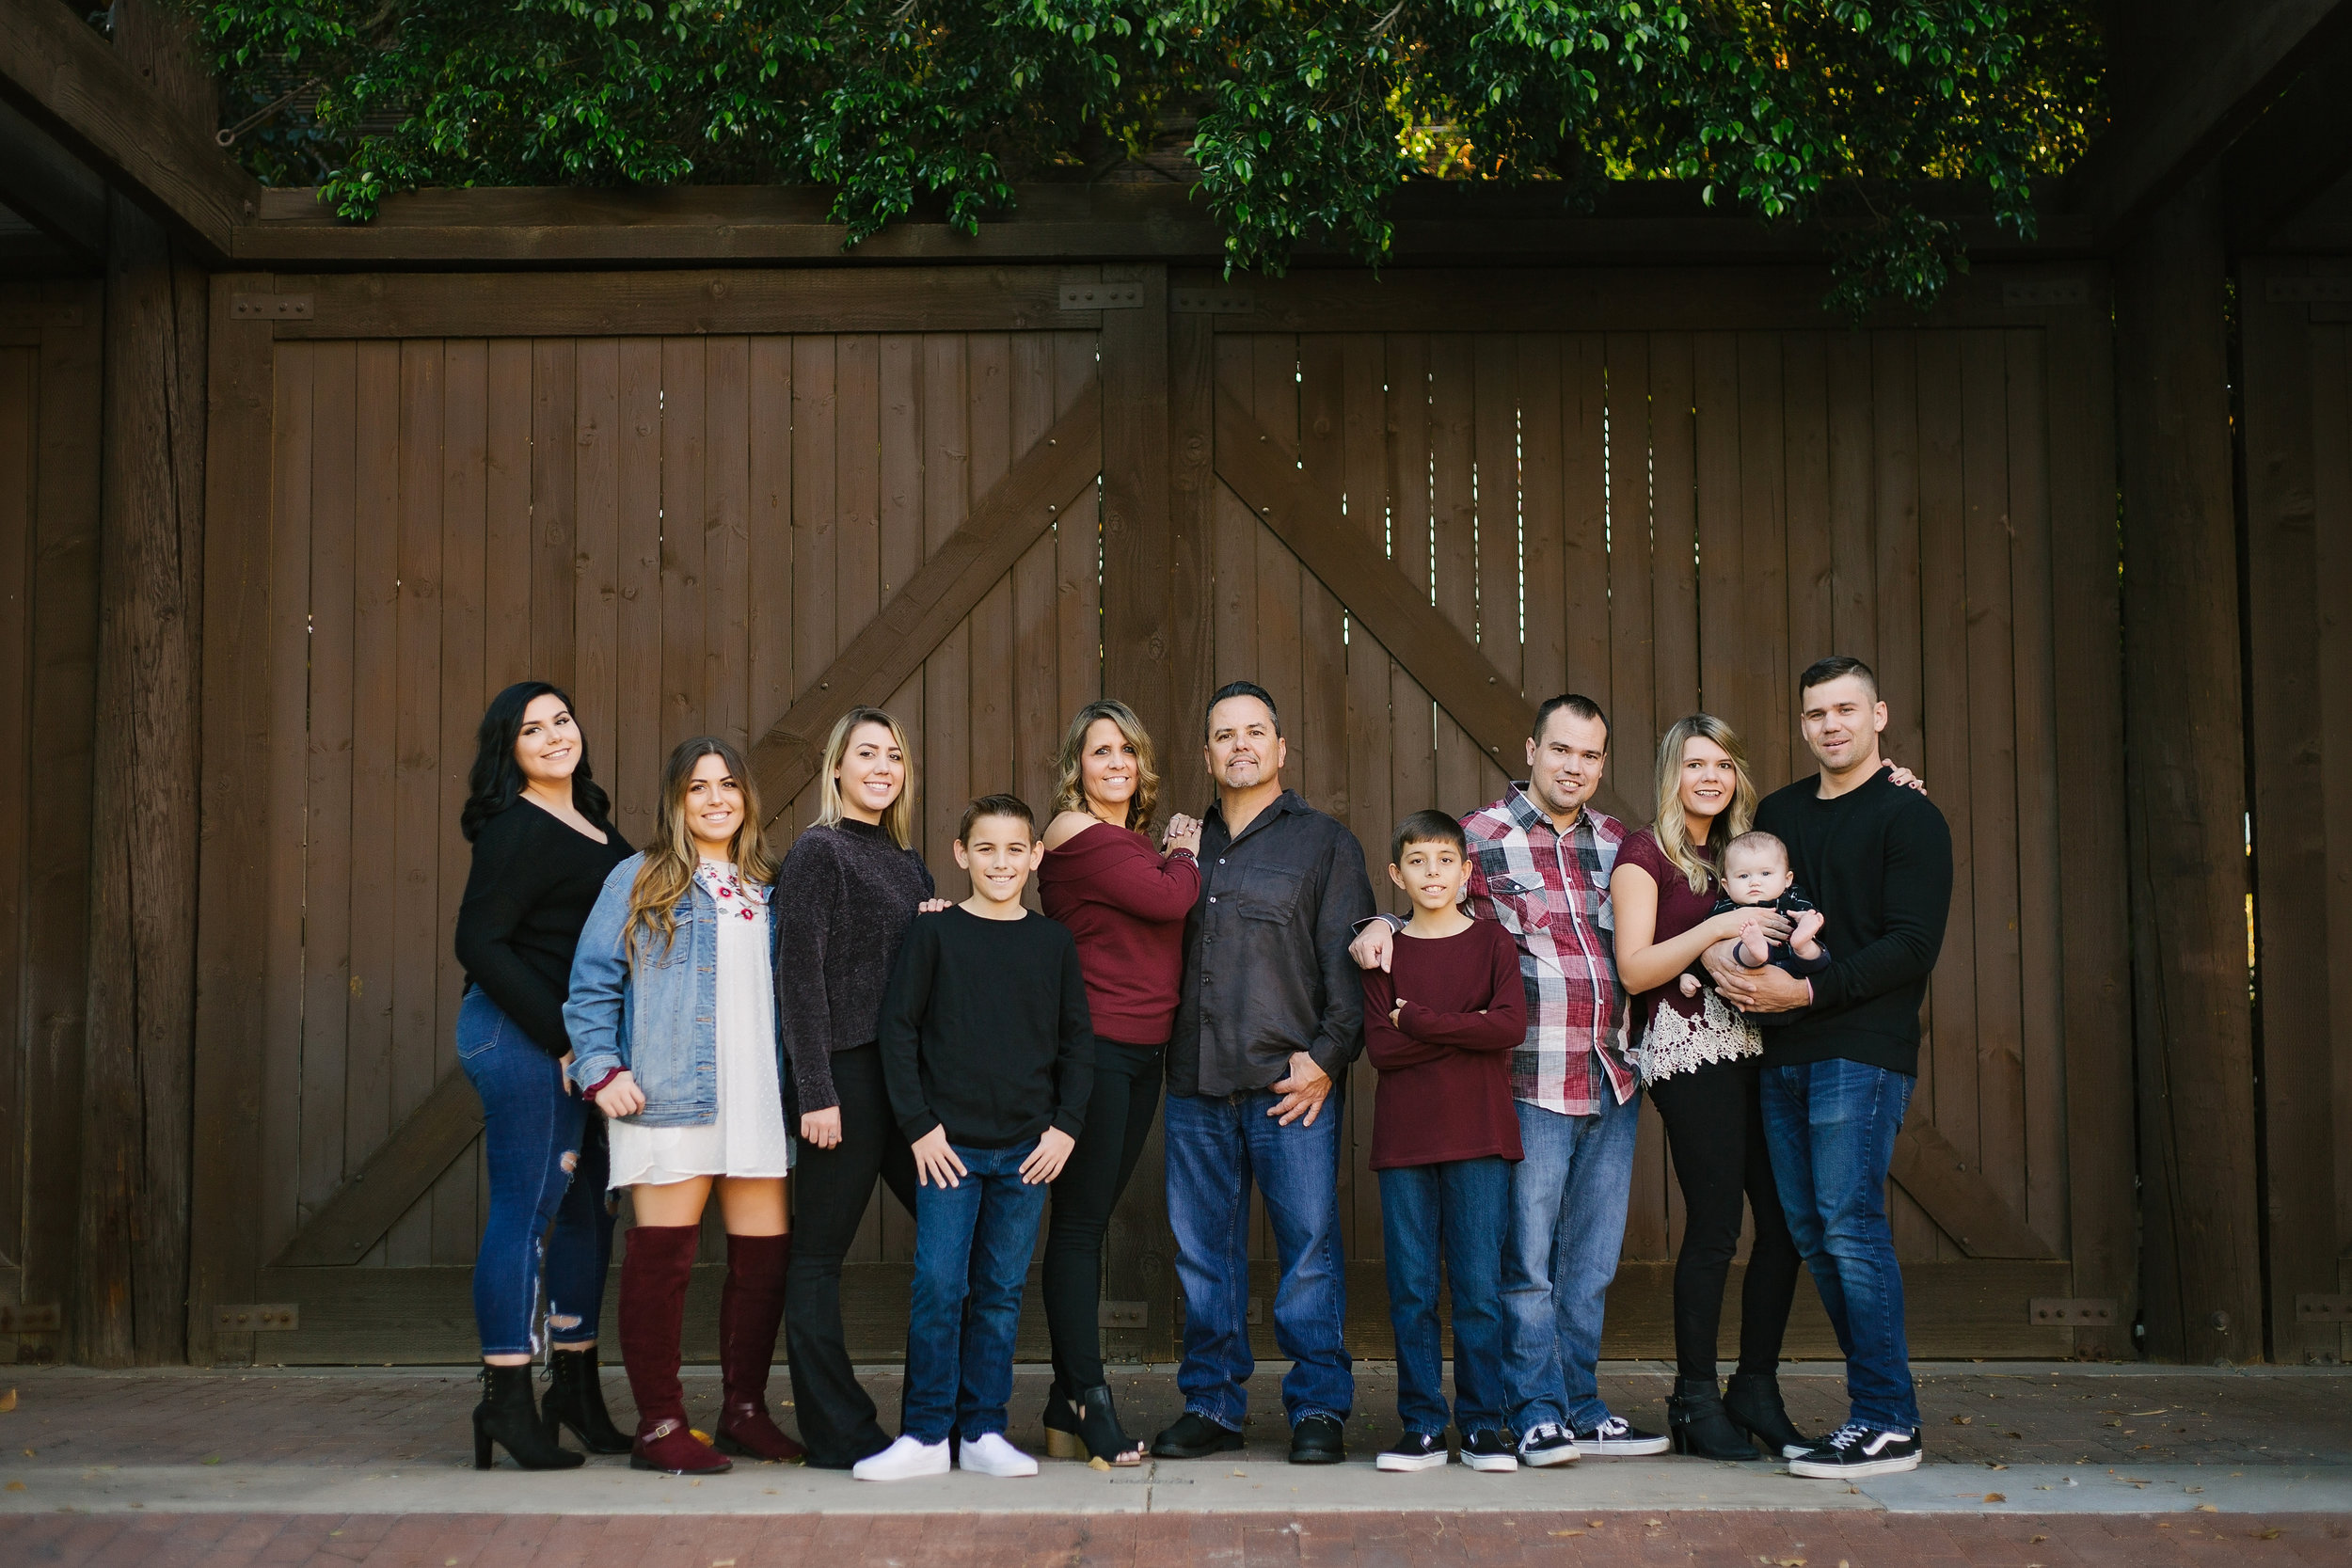 scottsdale family portraits, Headshot photographer Anjeanette Photography Phx Arizona desert botanical garden Places to take family pictures Peoria Az Anthem